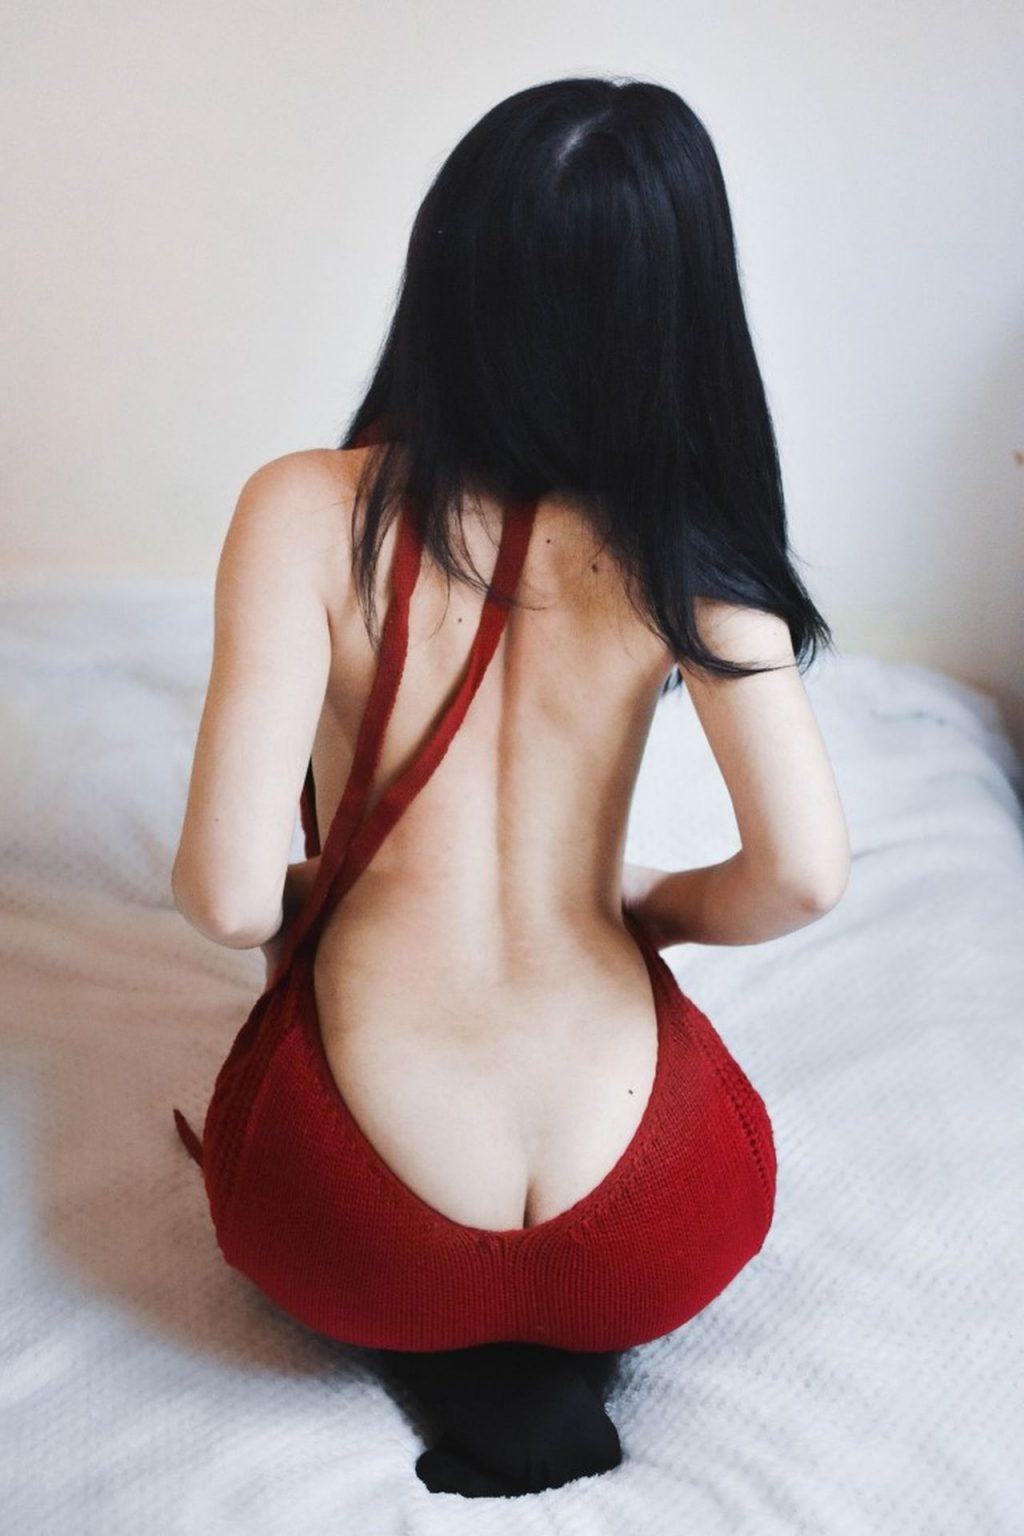 Valentina Kryp Sexy (5 Photos)